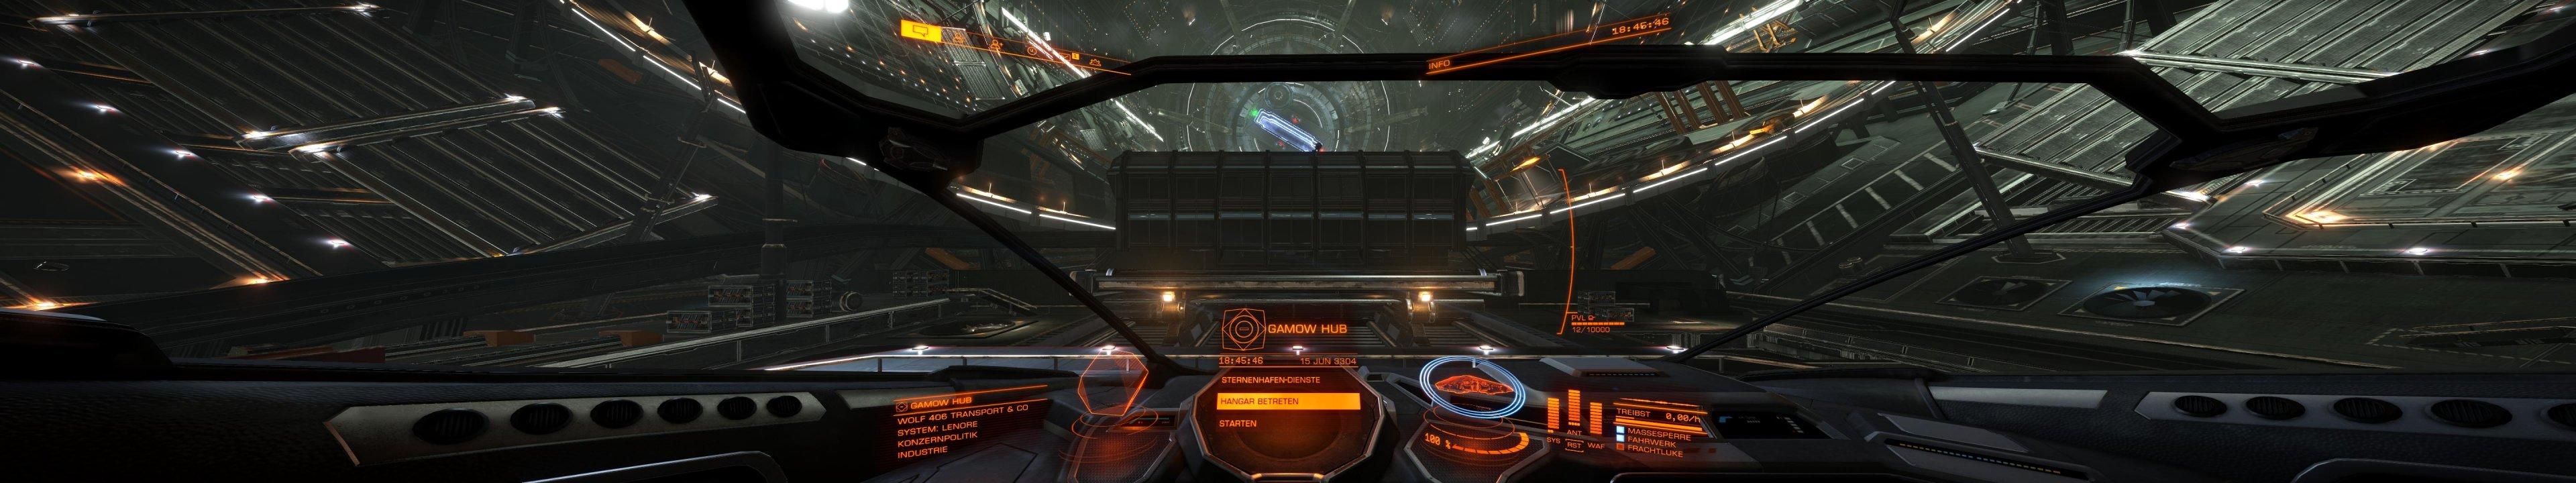 EliteDangerous64 2018-06-15 20-45-46-20.jpg